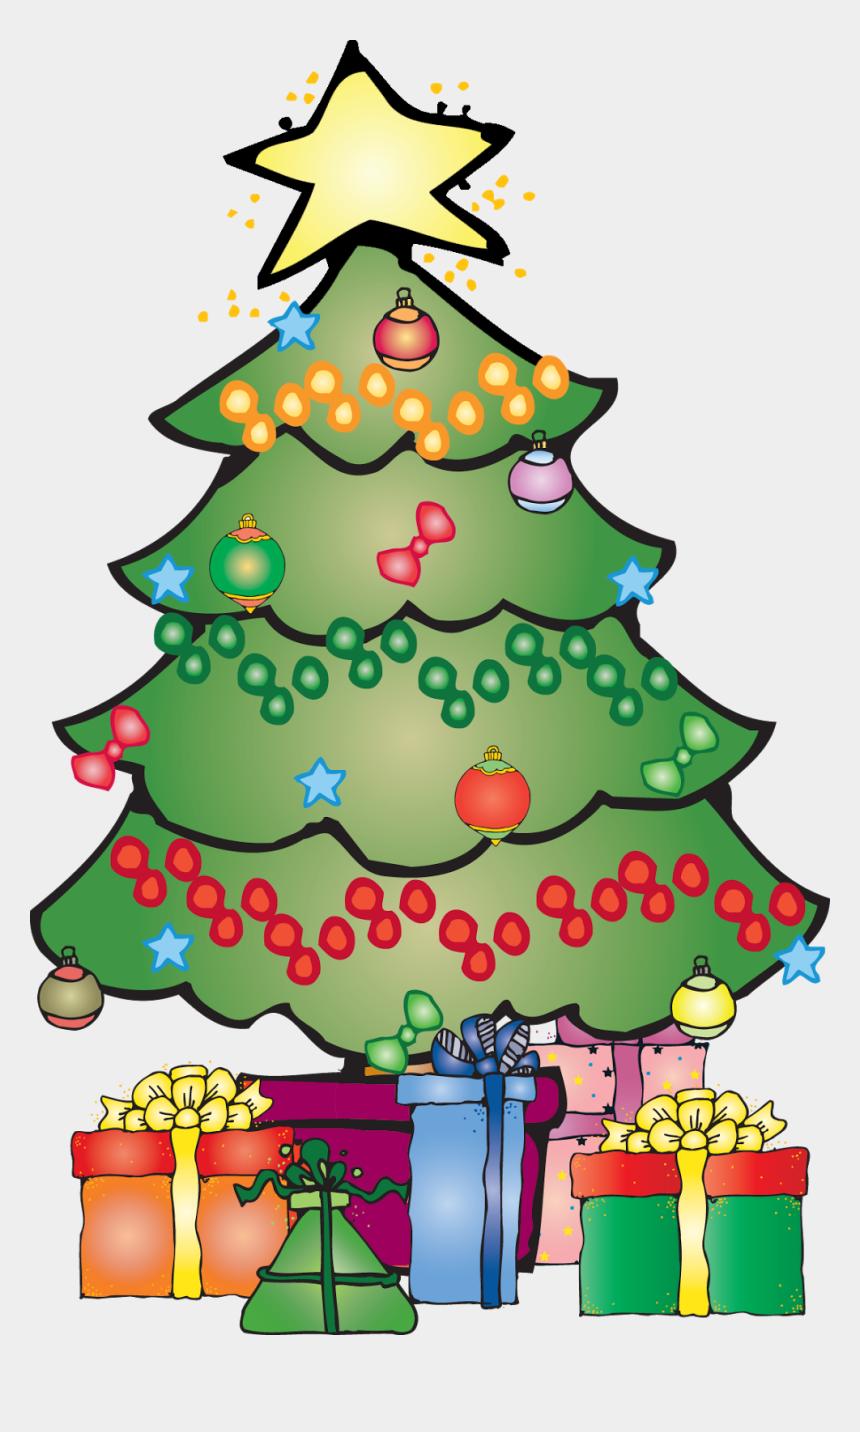 Christmas Tree Clipart Images.Preschool Tree Cliparts Christmas Tree Clipart Melonheadz